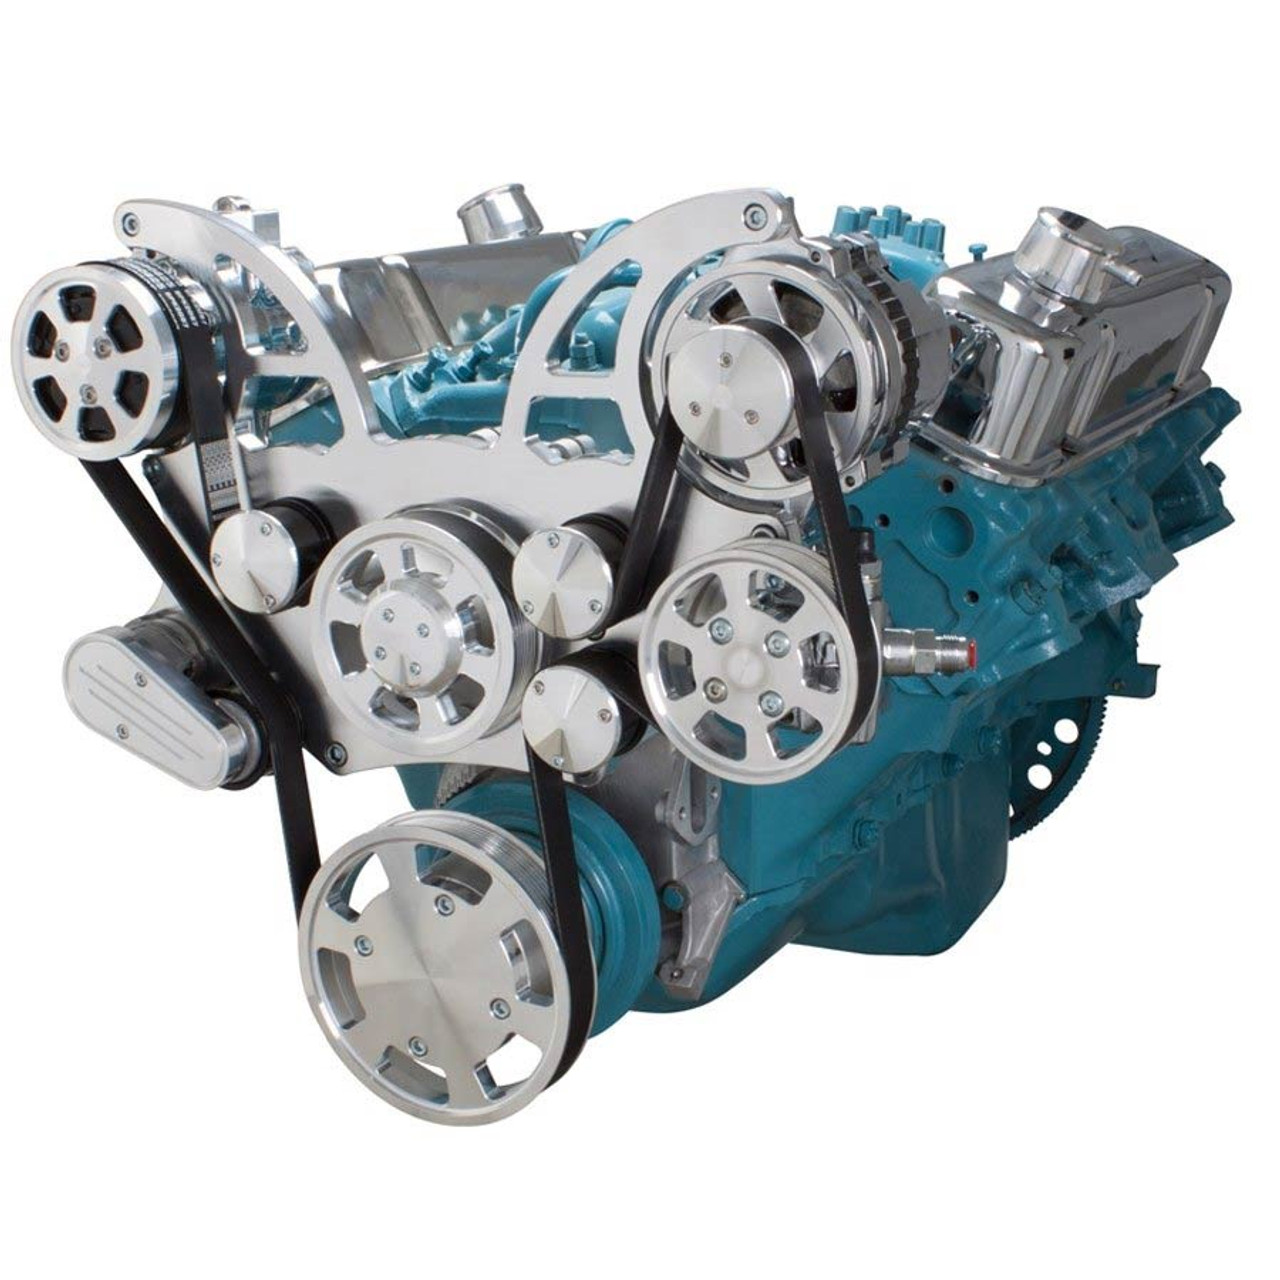 medium resolution of serpentine conversion kit for pontiac 350 400 428 455 v8 engines 2001 lexus is300 engine diagram pontiac 350 engine diagram